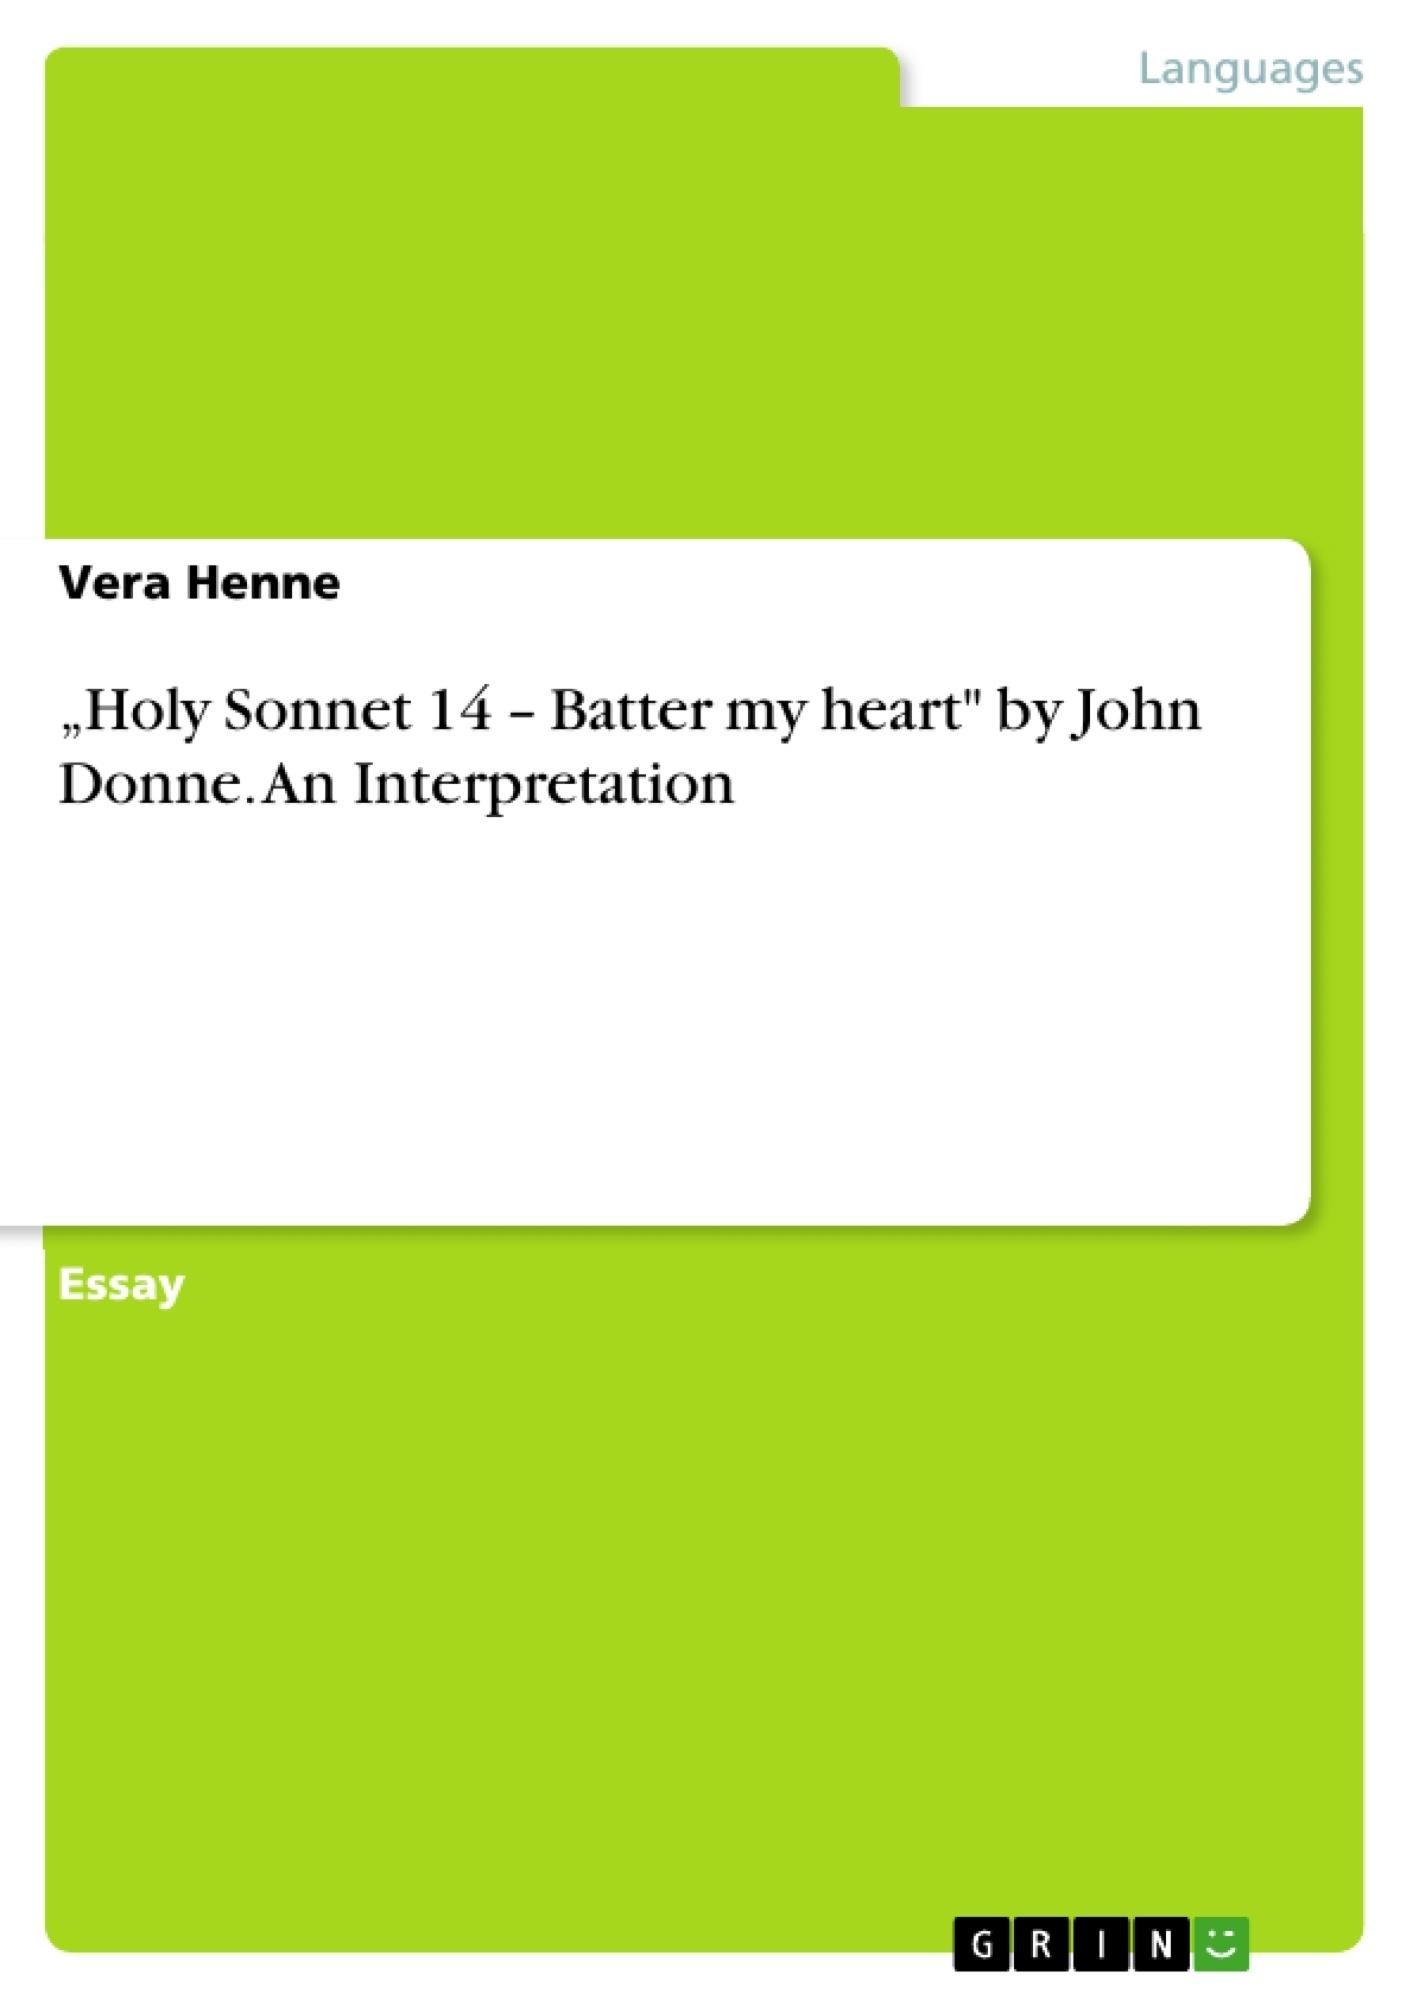 batter my heart john donne analysis